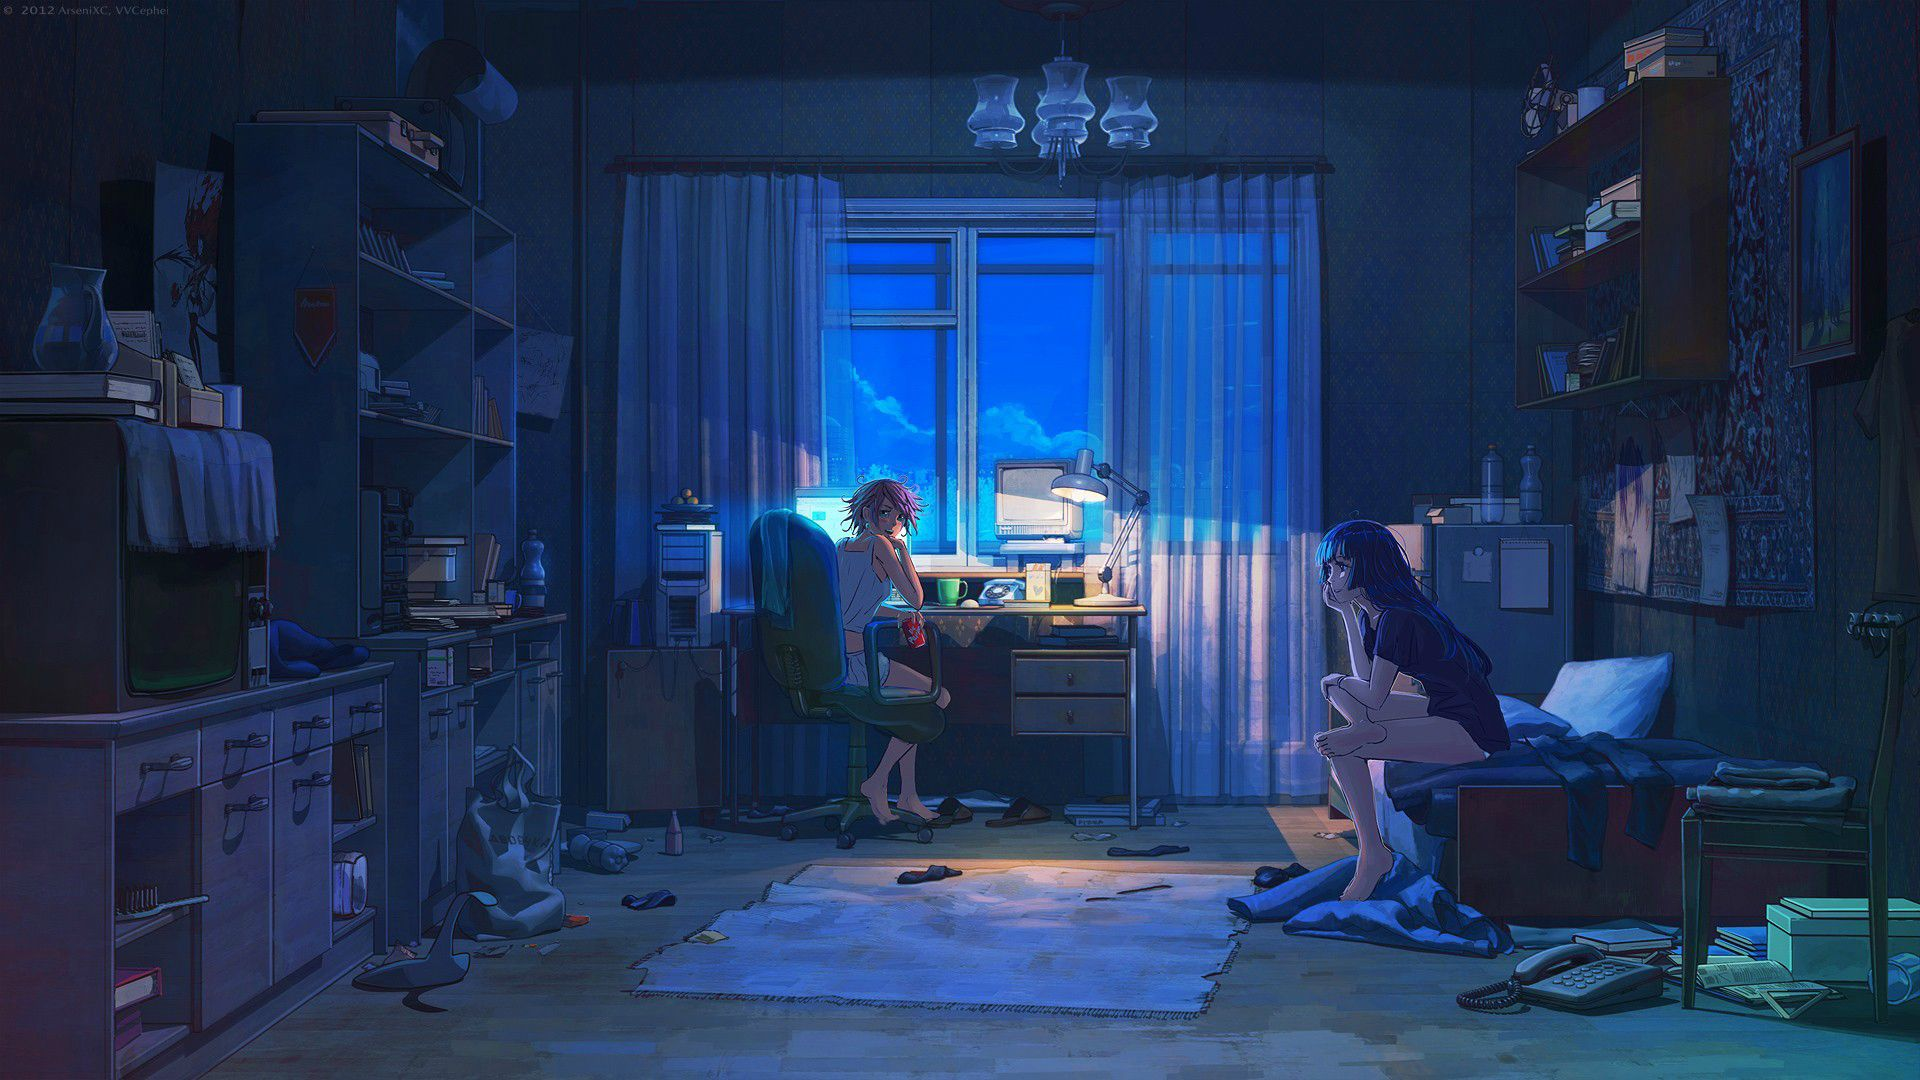 1920x1080 Aesthetic Anime Background